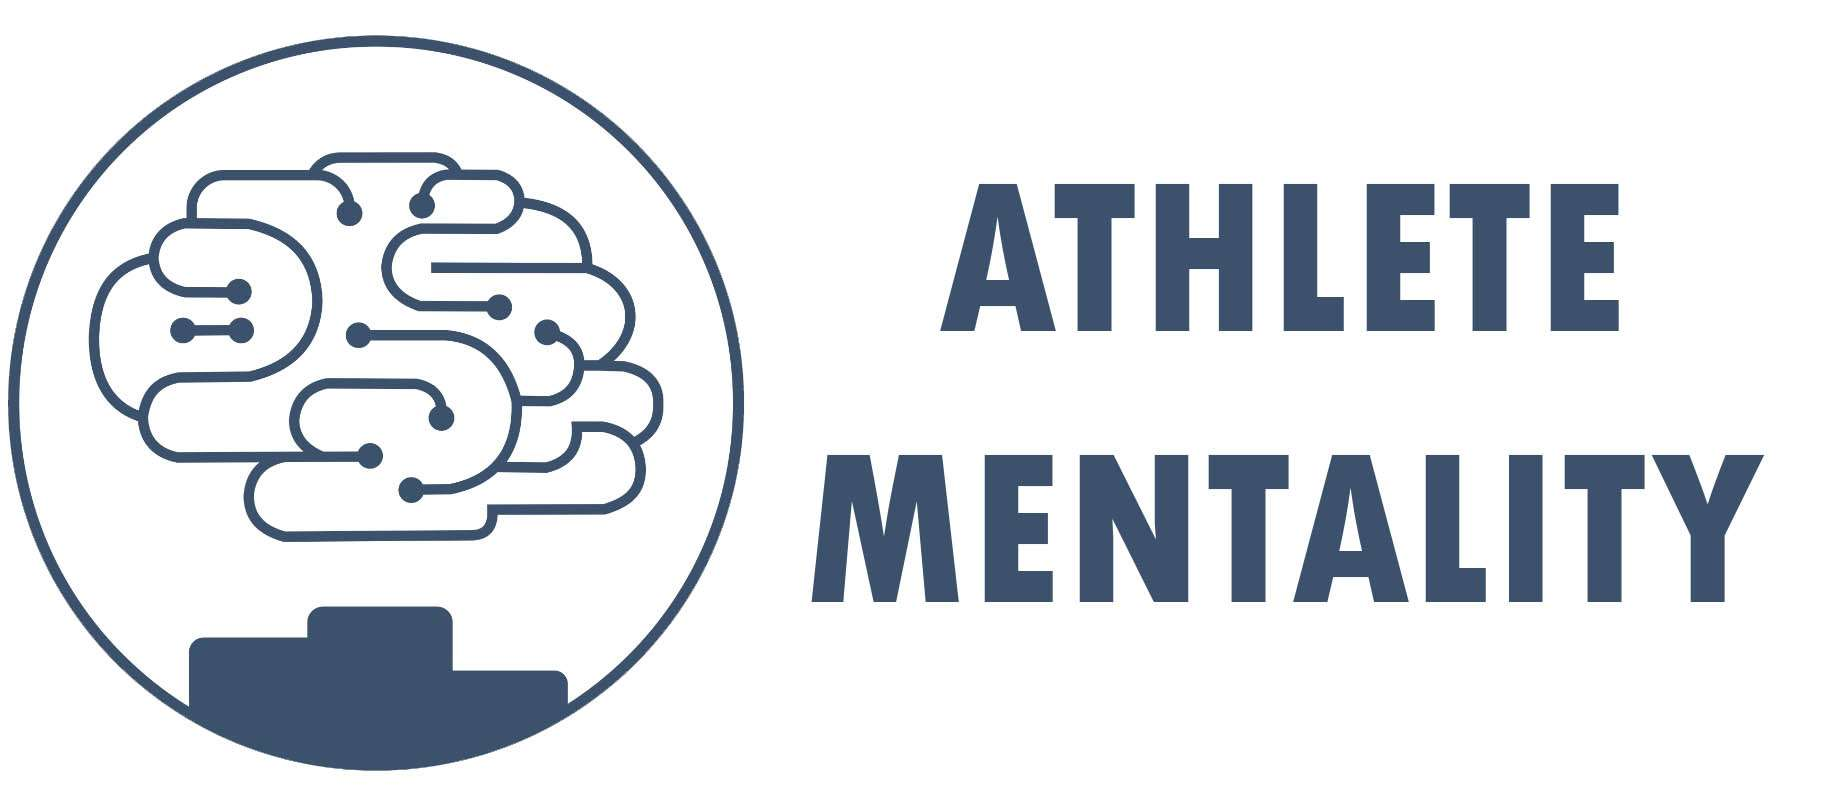 athlete mentality